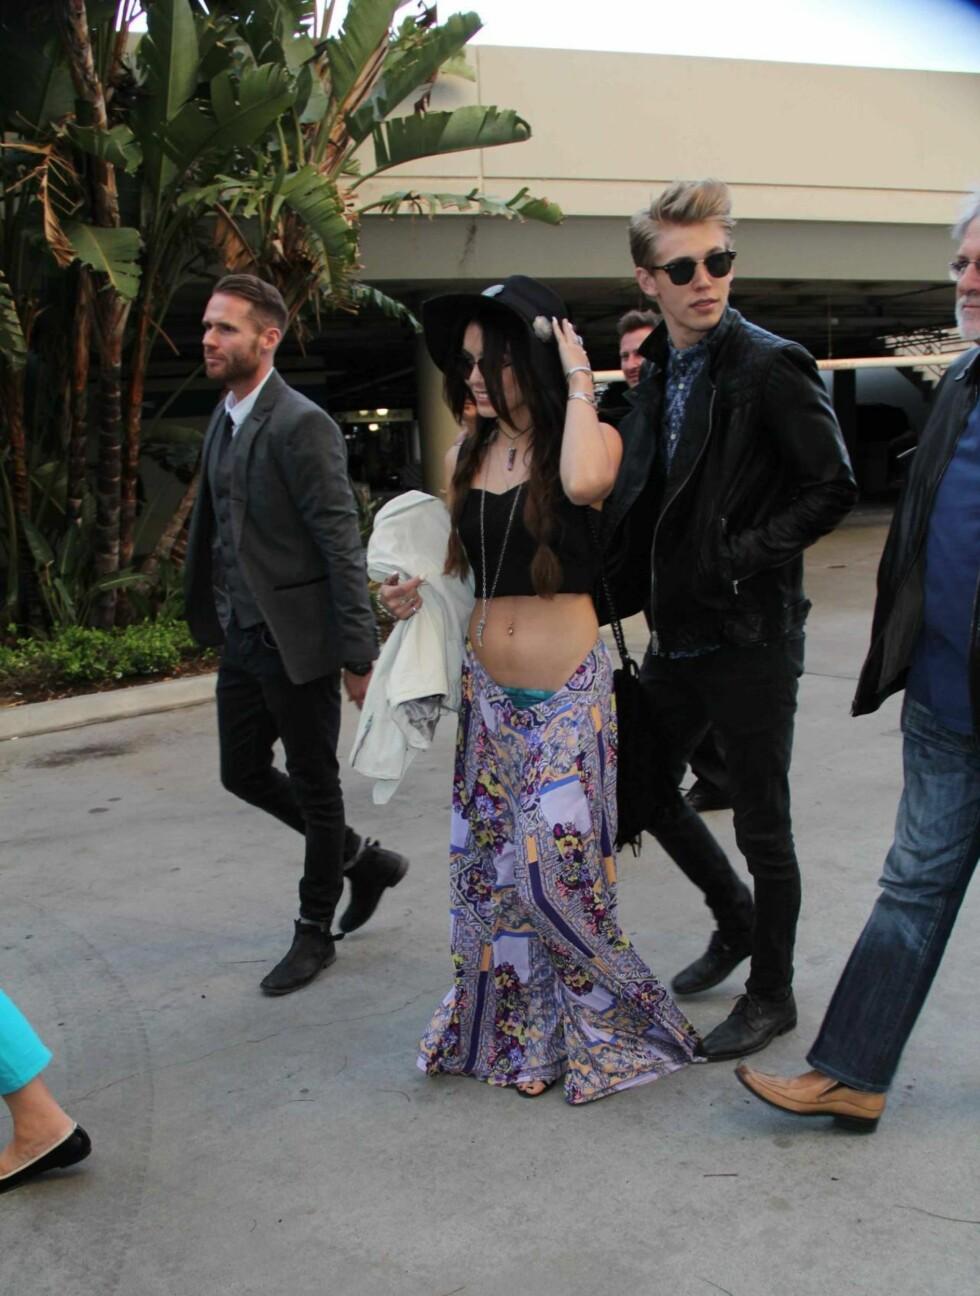 TRUSEGLIPP: Vanessa Hudgens truse kom til syne da kjæresten Austin tråkket på buksen hennes. Foto: All Over Press